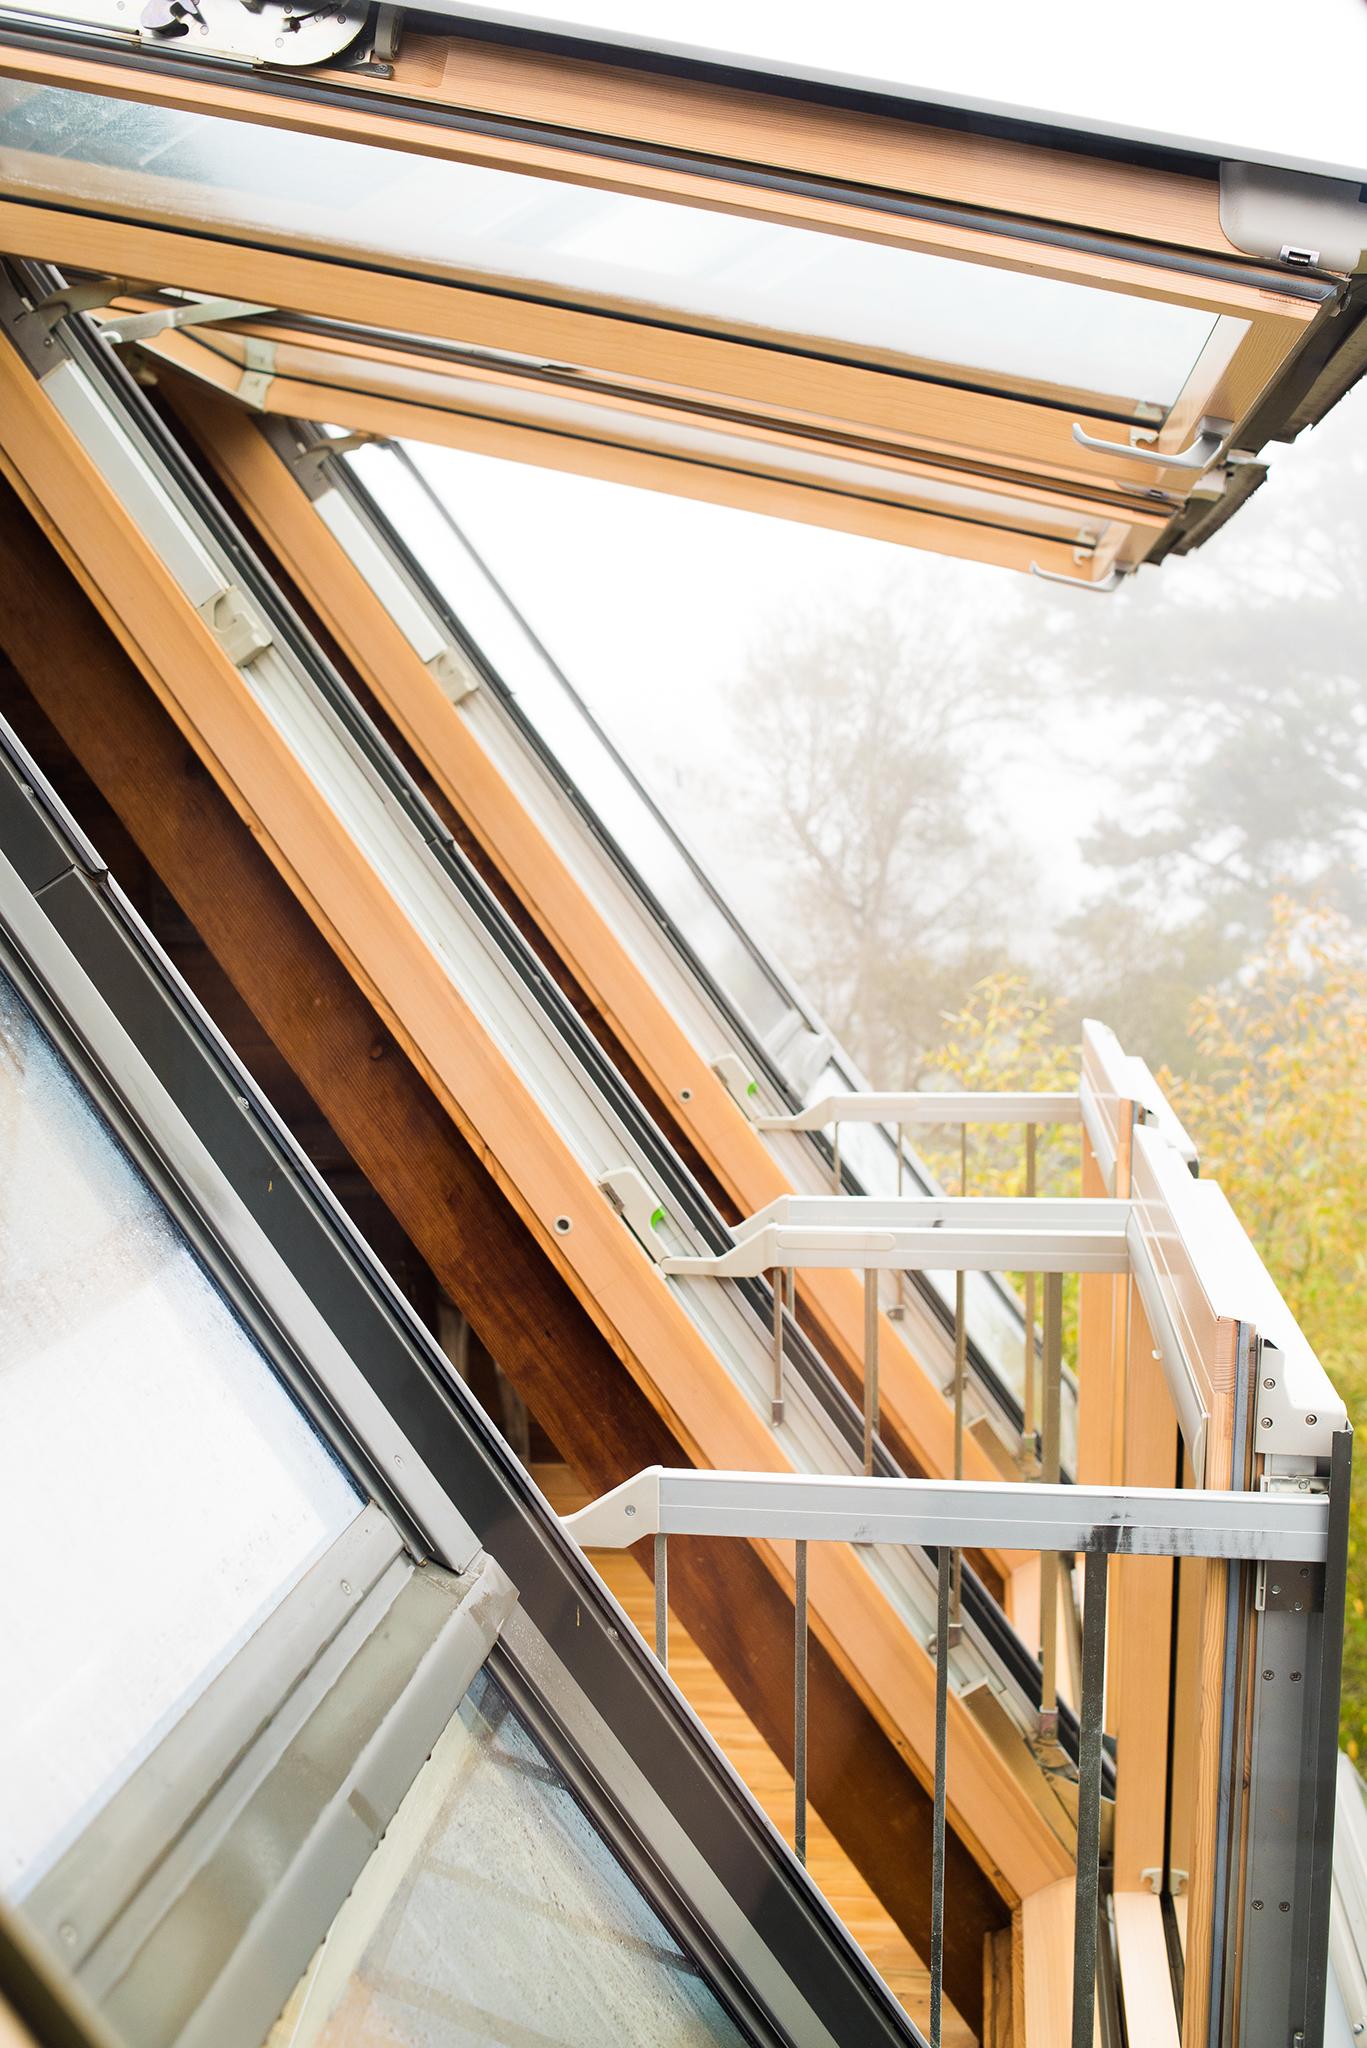 Close up of balcony roof window